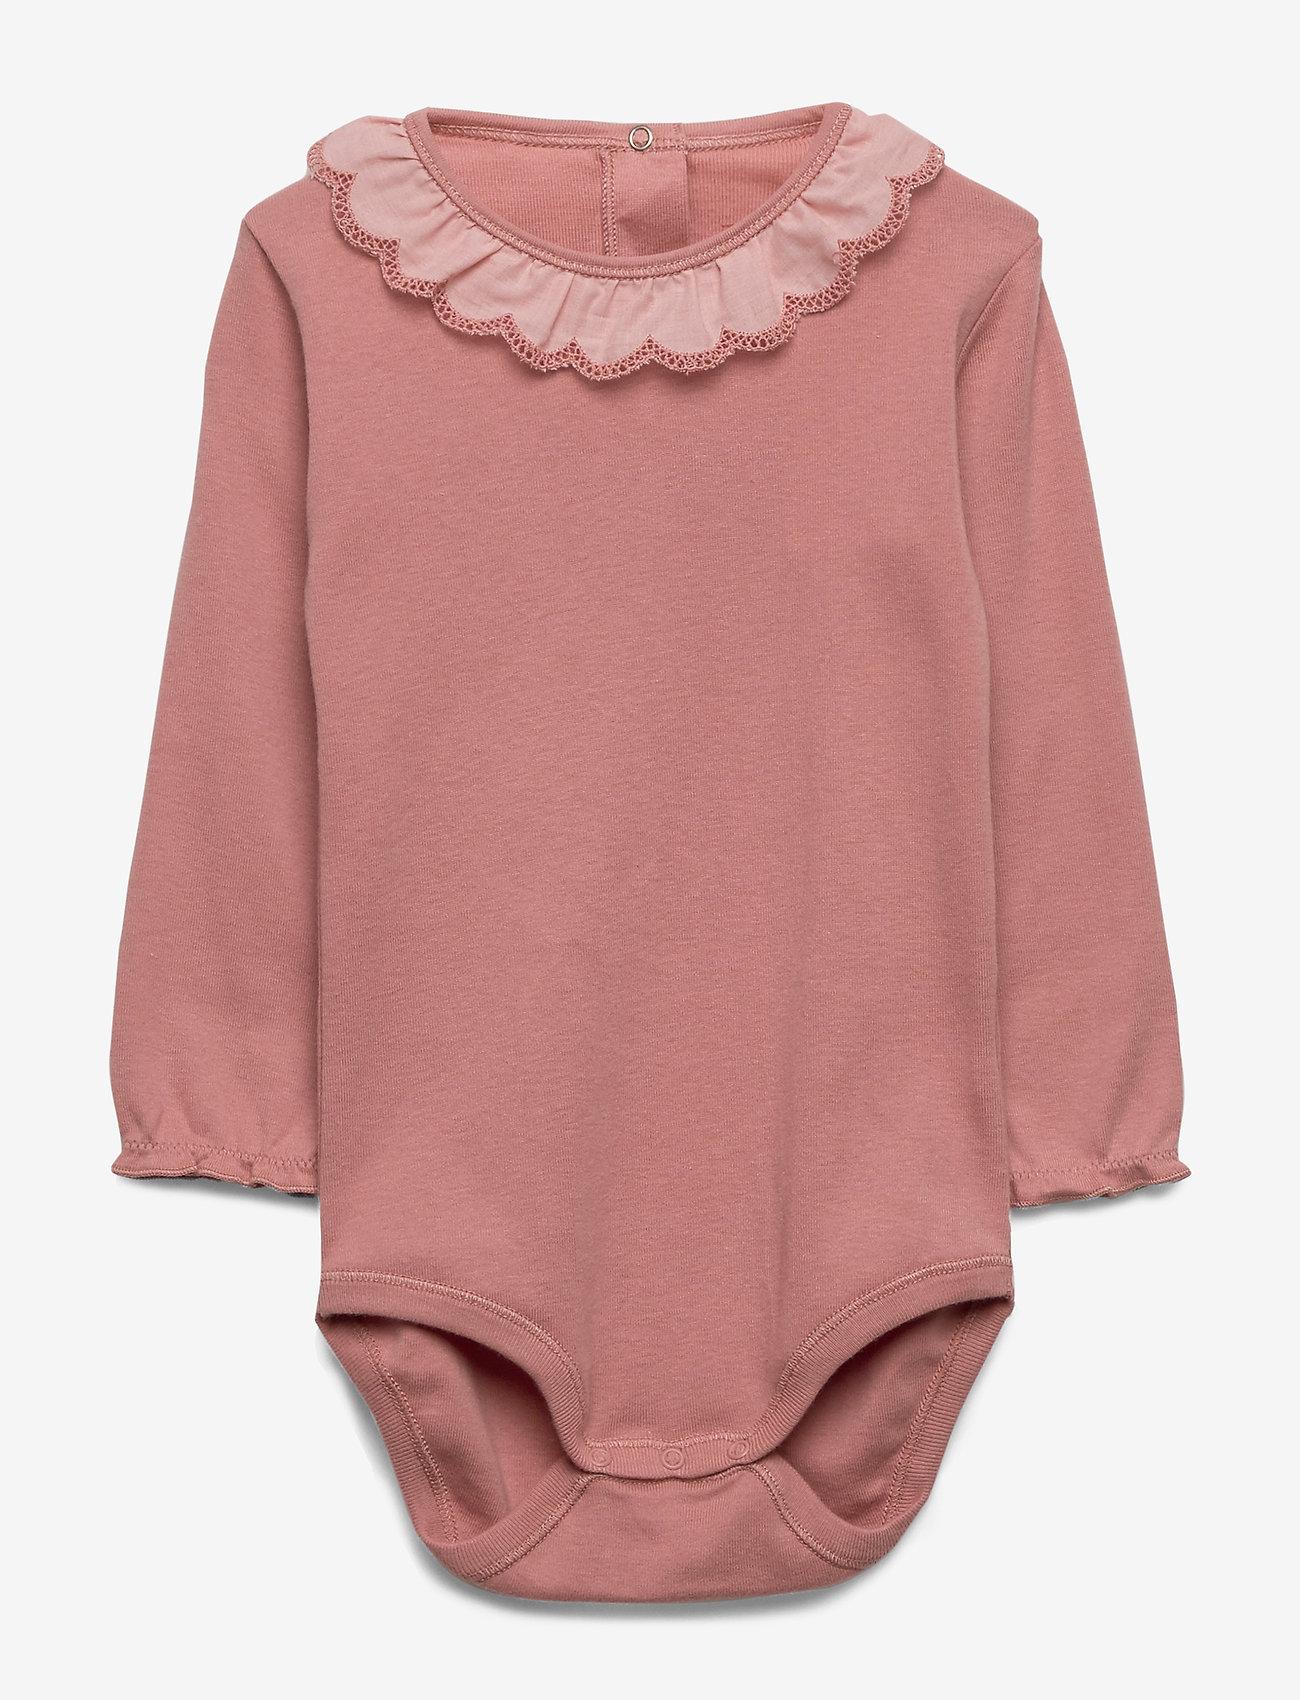 Noa Noa Miniature - Baby Body - long-sleeved - dusty rose - 0